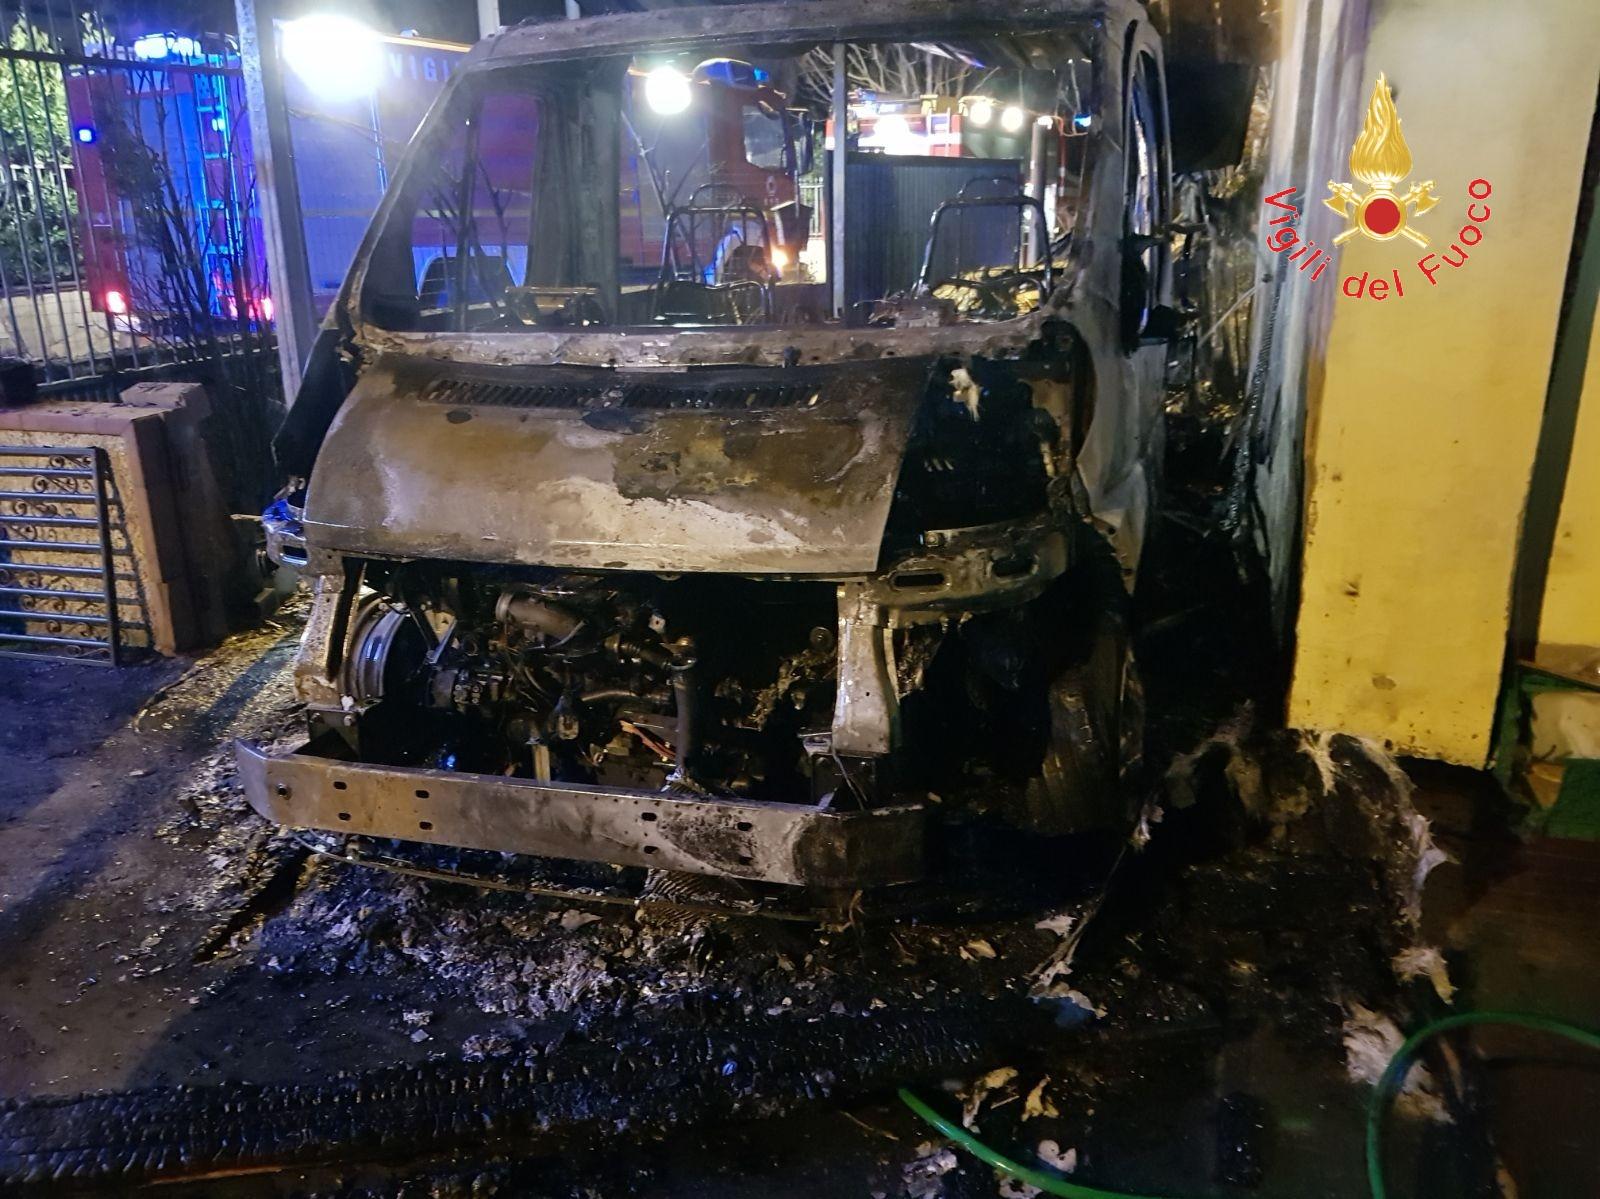 Notte di paura a Lamezia, diversi incendi a CapizzaglieCoinvolte autovetture, scooter e un camper: indagini